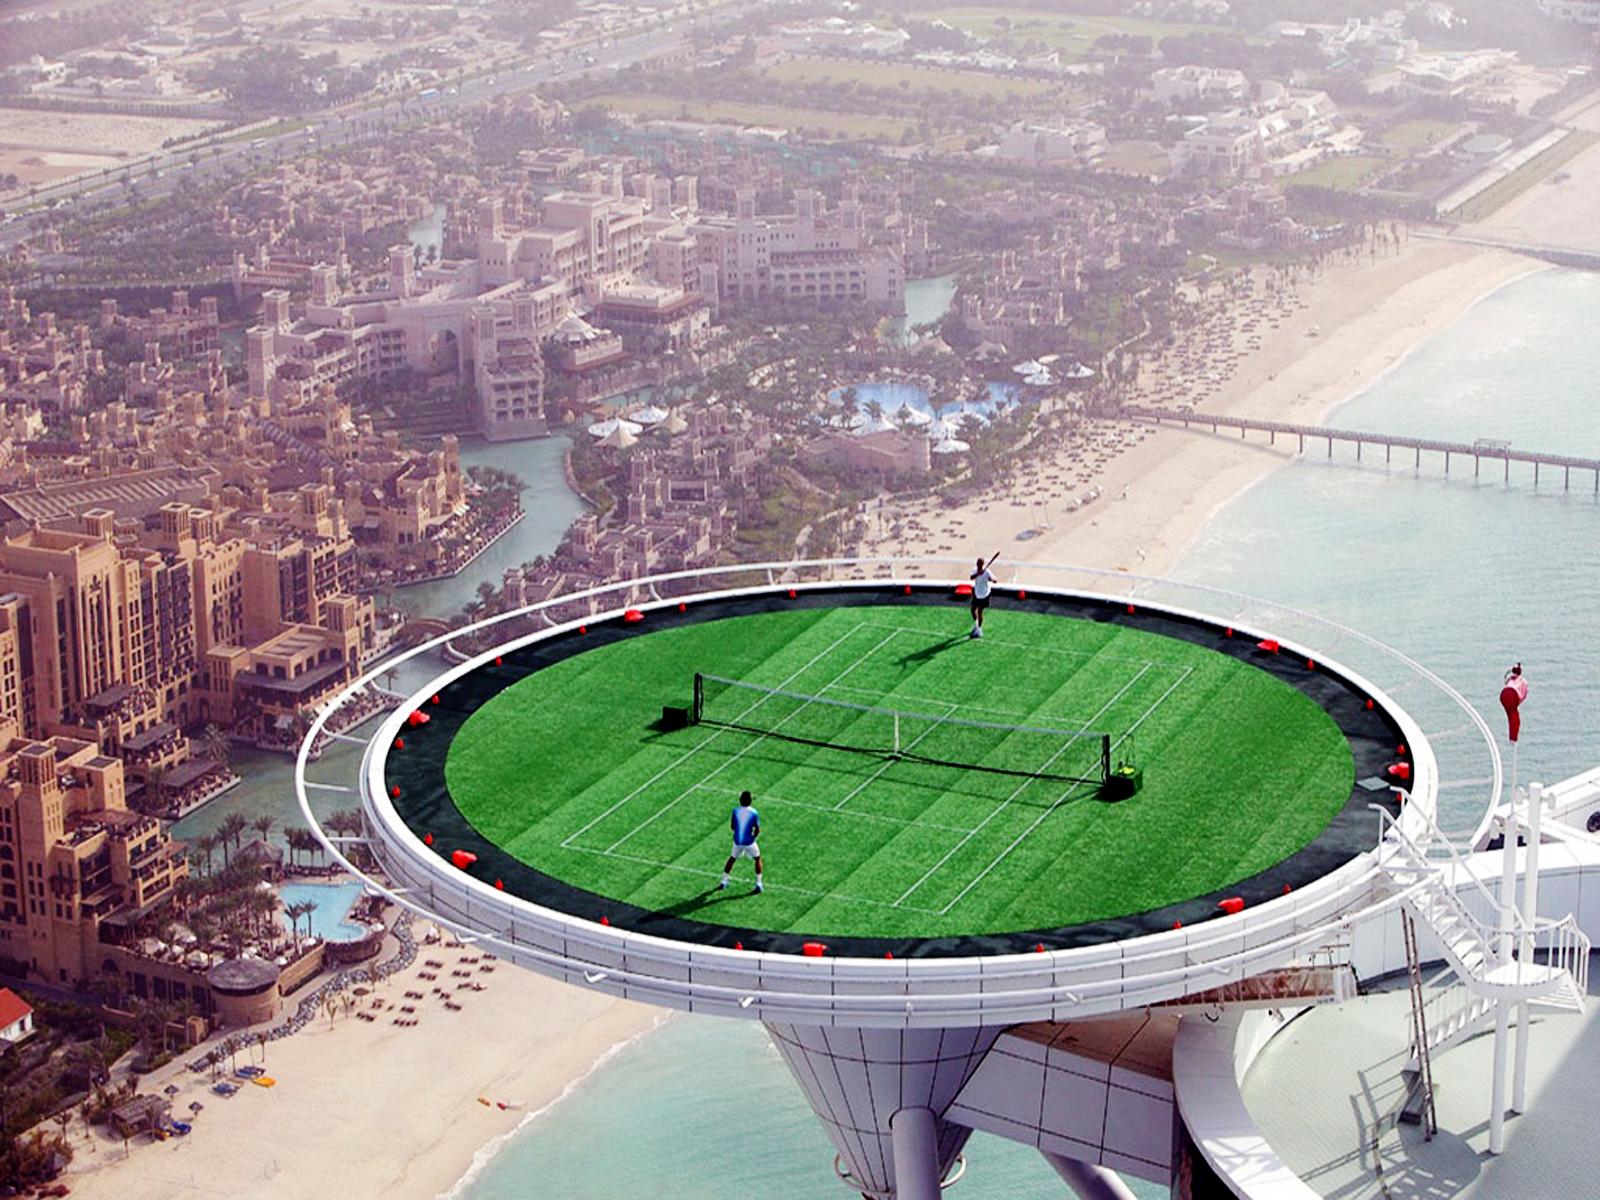 Luxury hotel burj al arab hd wallpapers desktop wallpapers for Exclusive hotel dubai